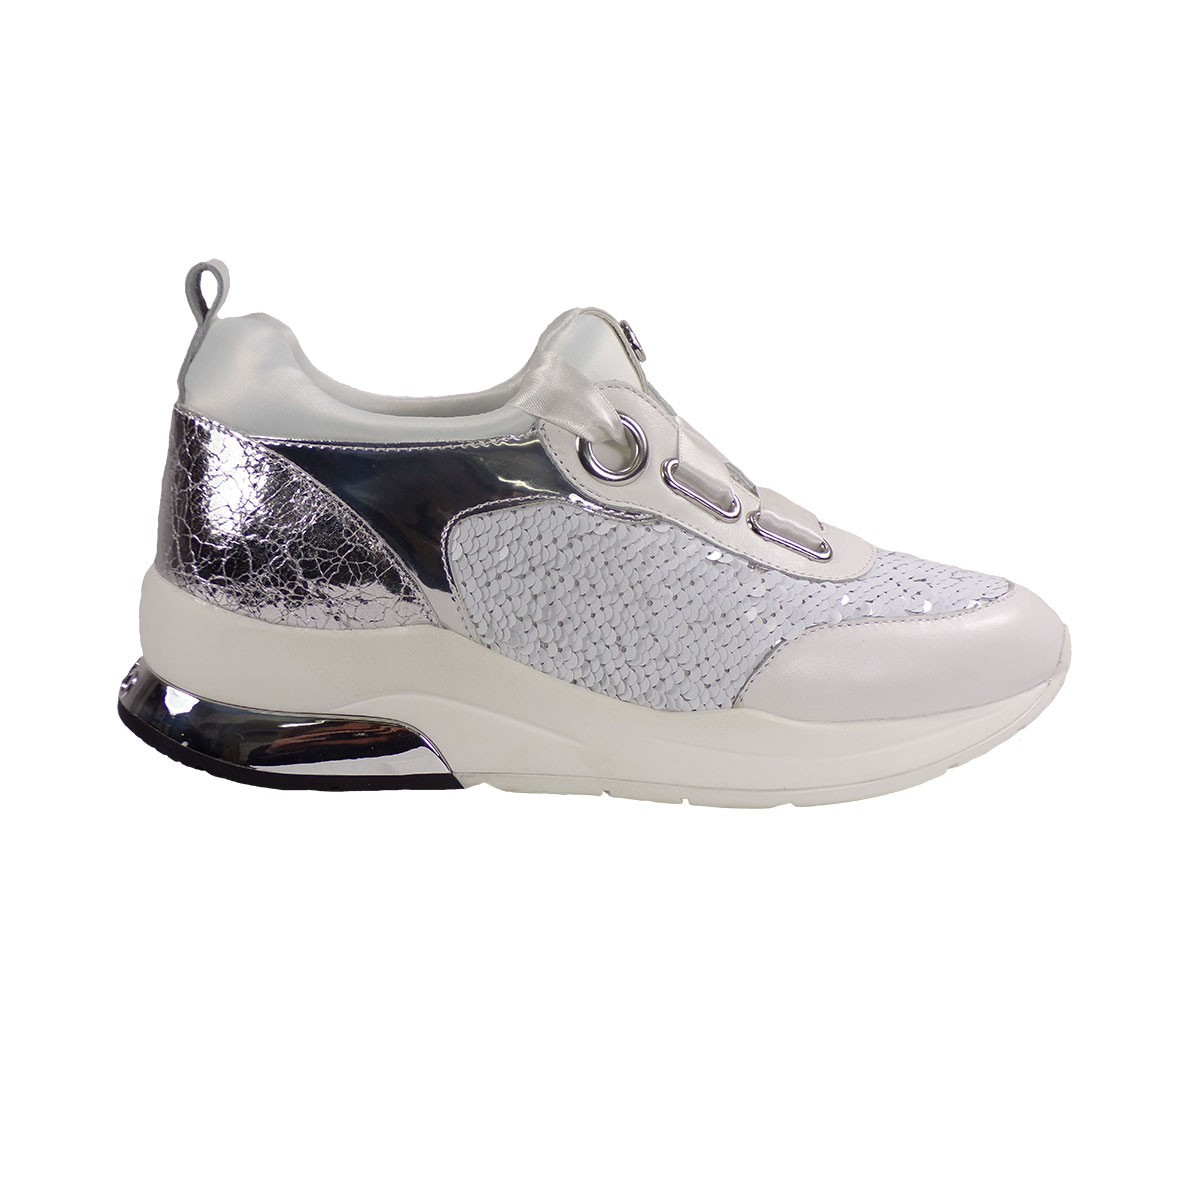 2eaa04914b9 Liu-Jo Sneakers Παπούτσια Γυναικεία B18013 Άσπρο